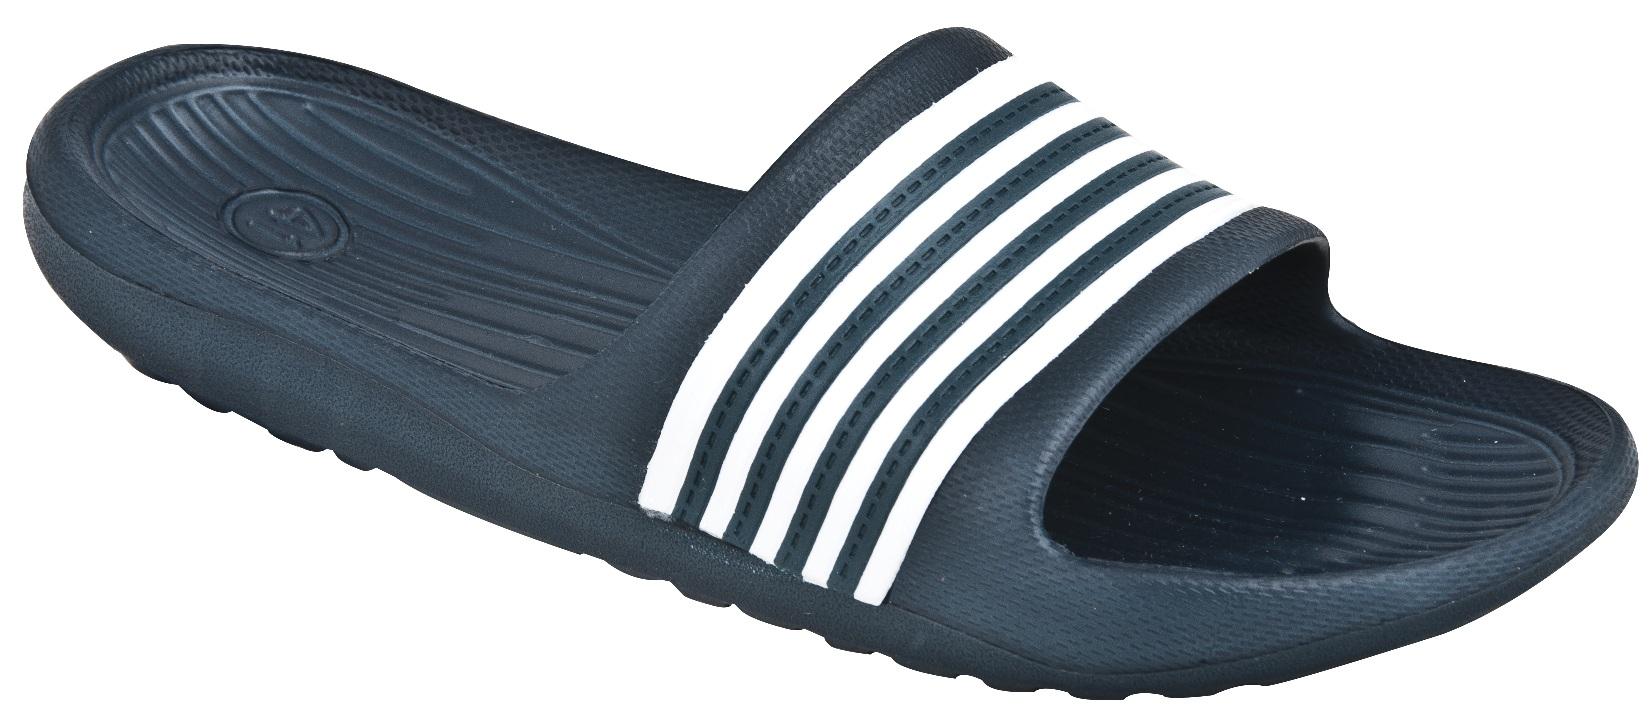 4093f9ea2594 Outdoorová obuv - Gumové šľapky PACIFIK OUTDOOR